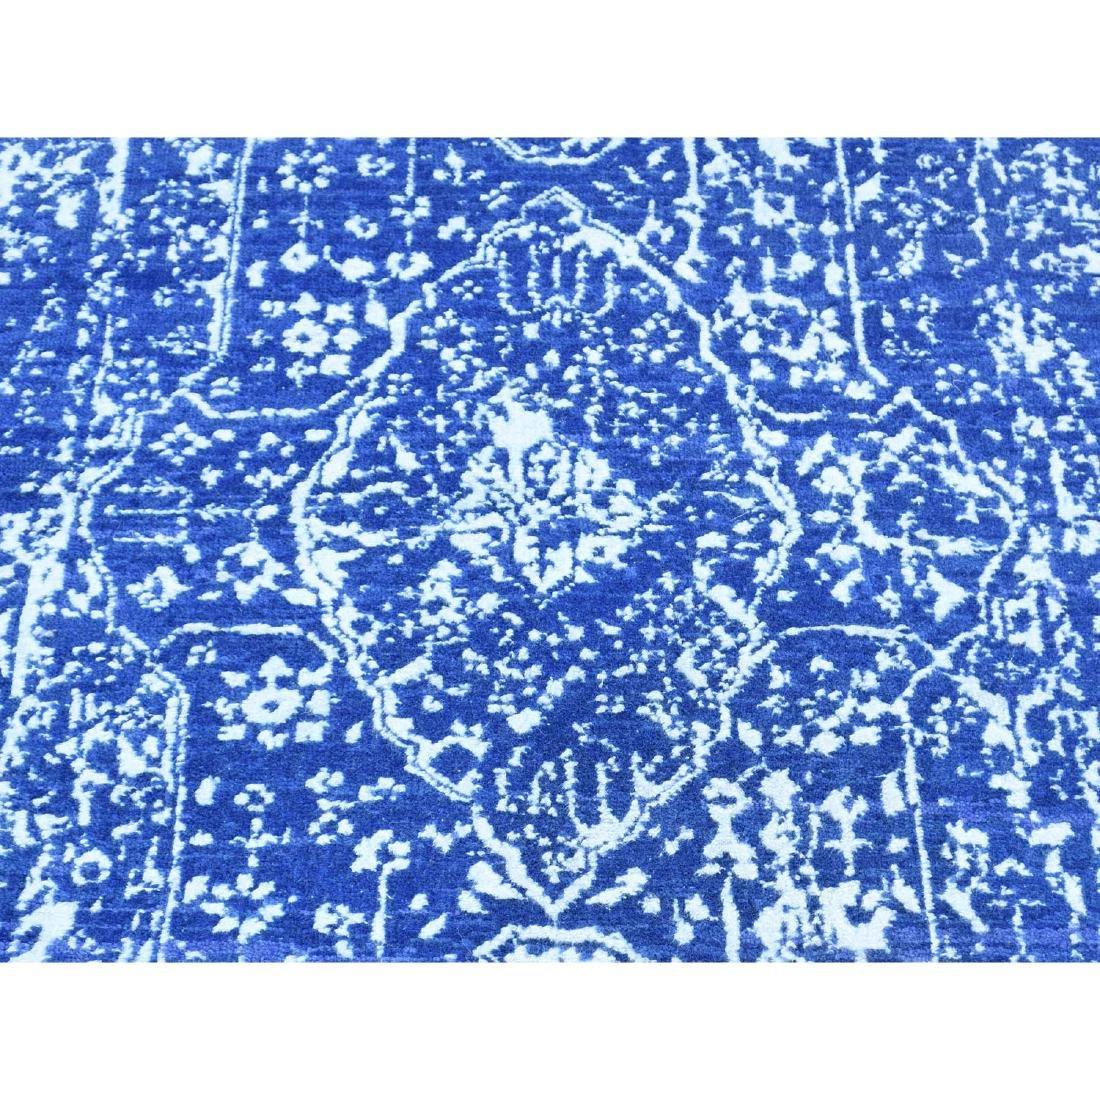 Wool and Silk Hand-Knotted Broken Persian Design Runner - 9